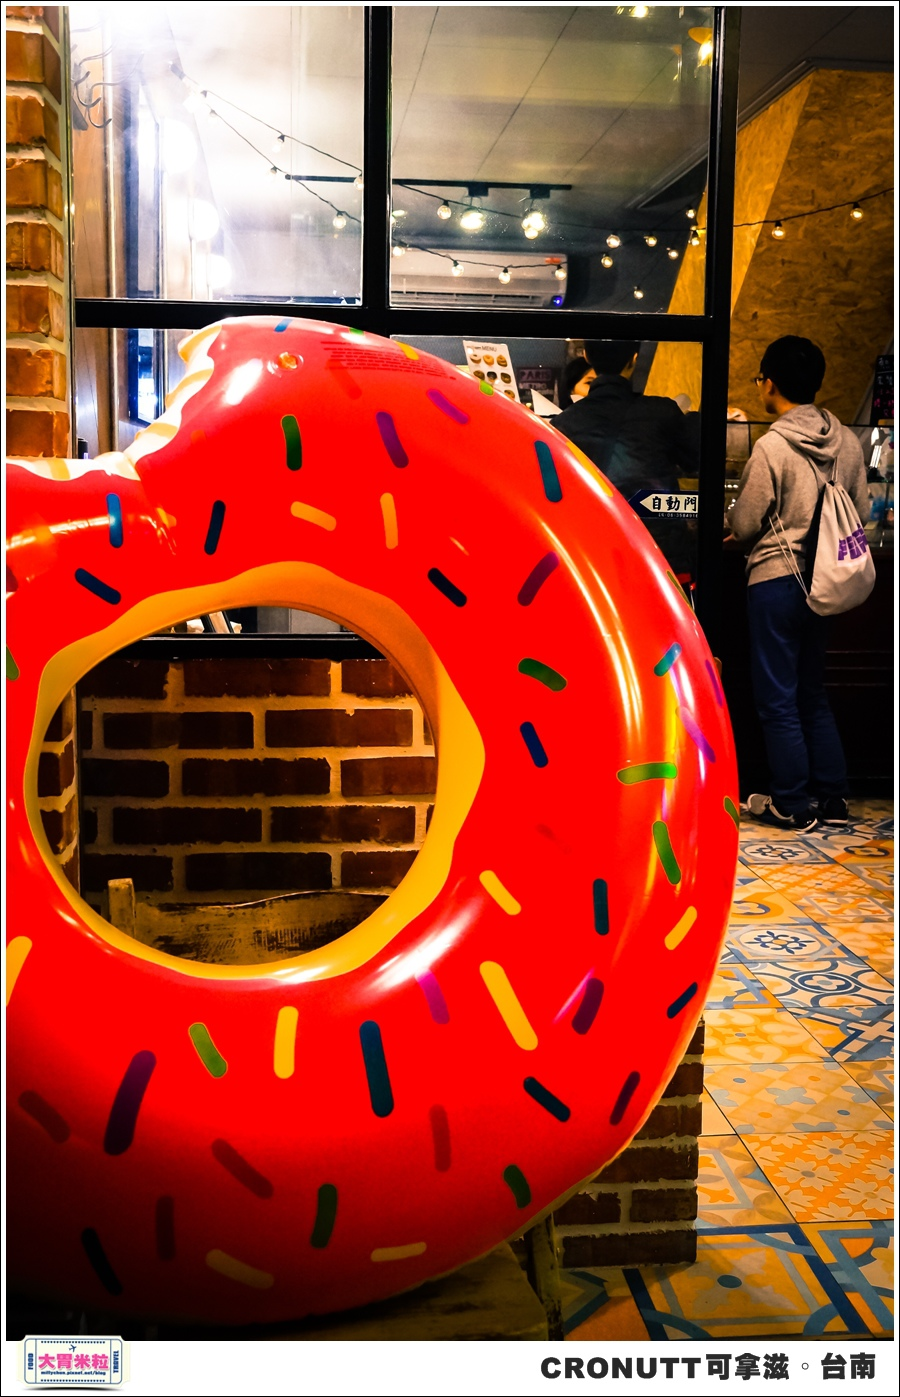 CRONUTT可拿滋台南店@紐約可頌甜甜圈@大胃米粒0004.jpg